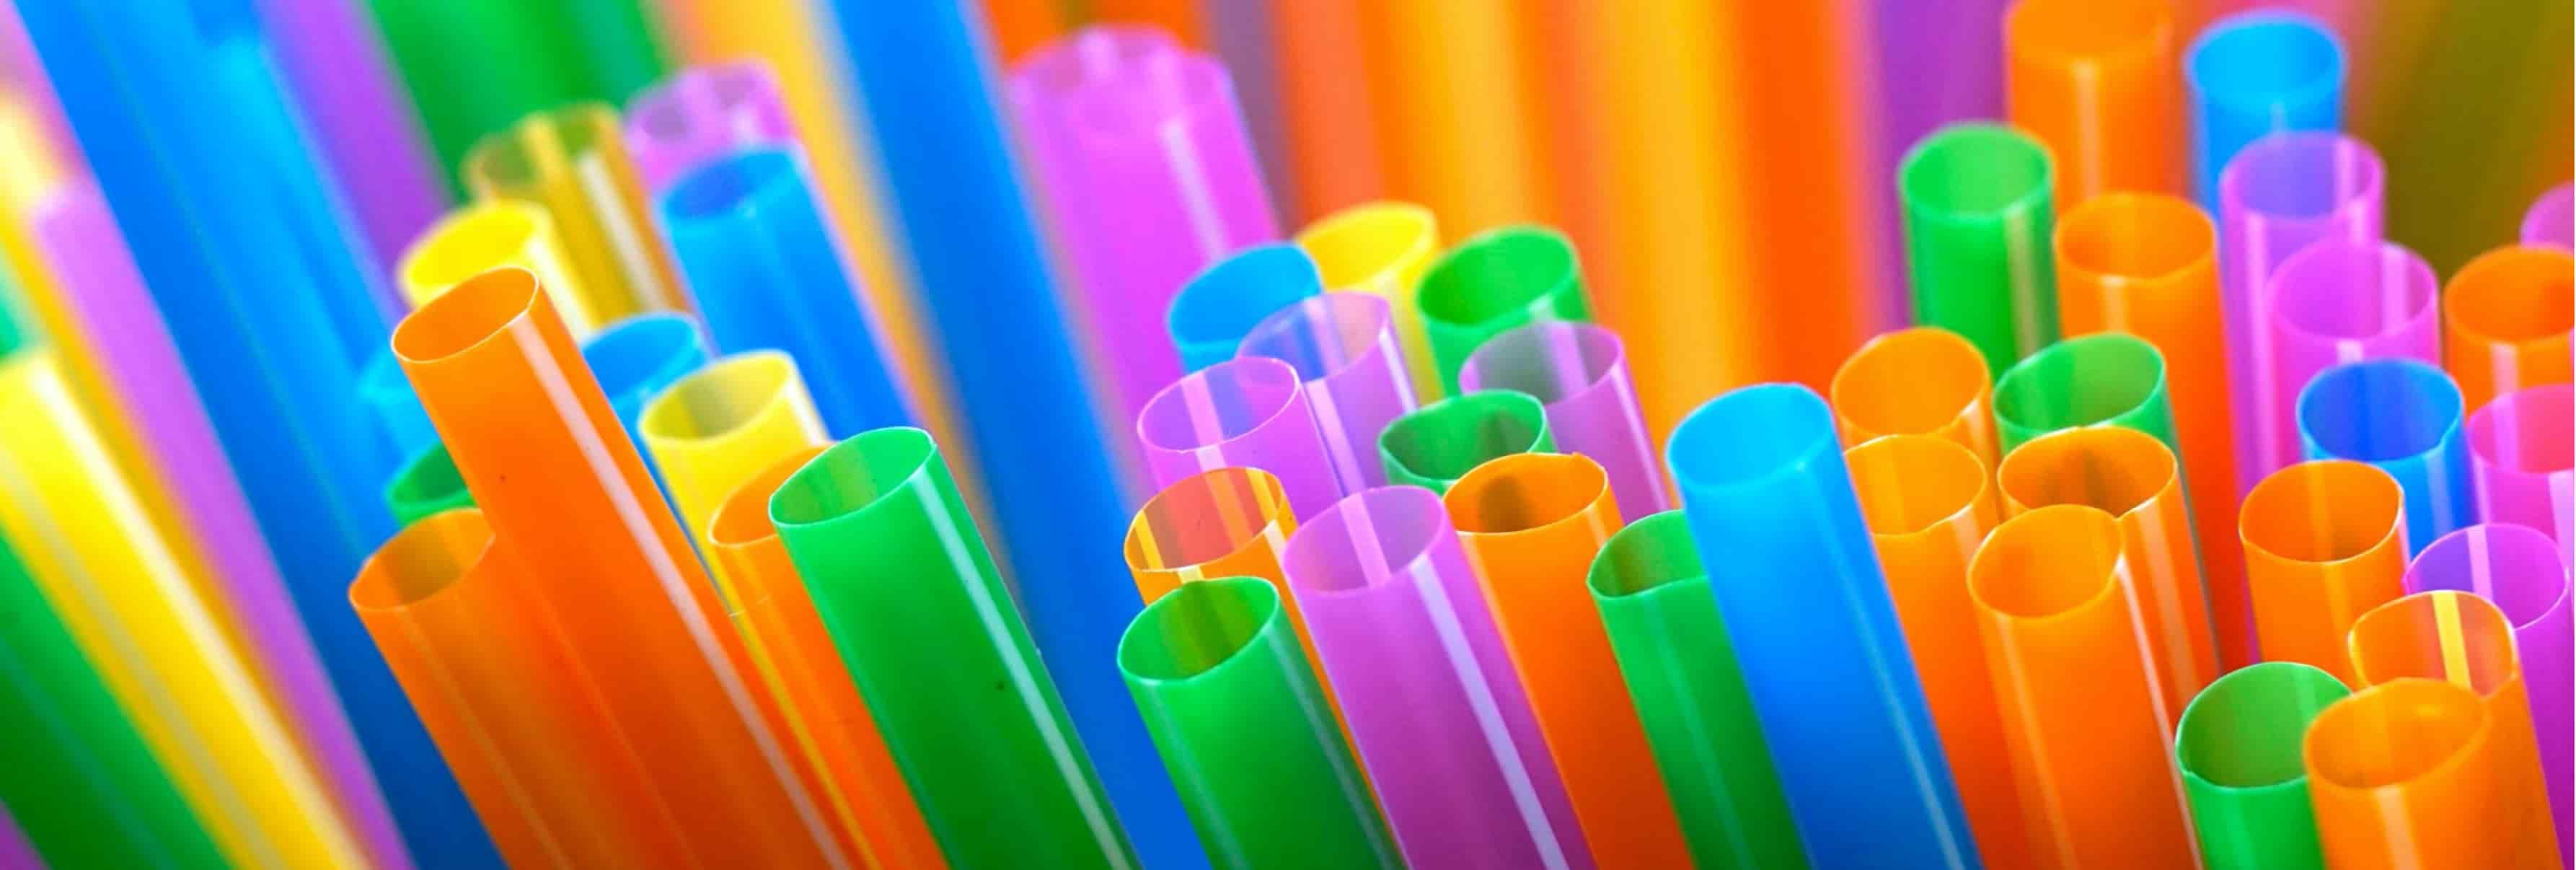 Cotton Bud, Stirrers and Plastic Straw Ban